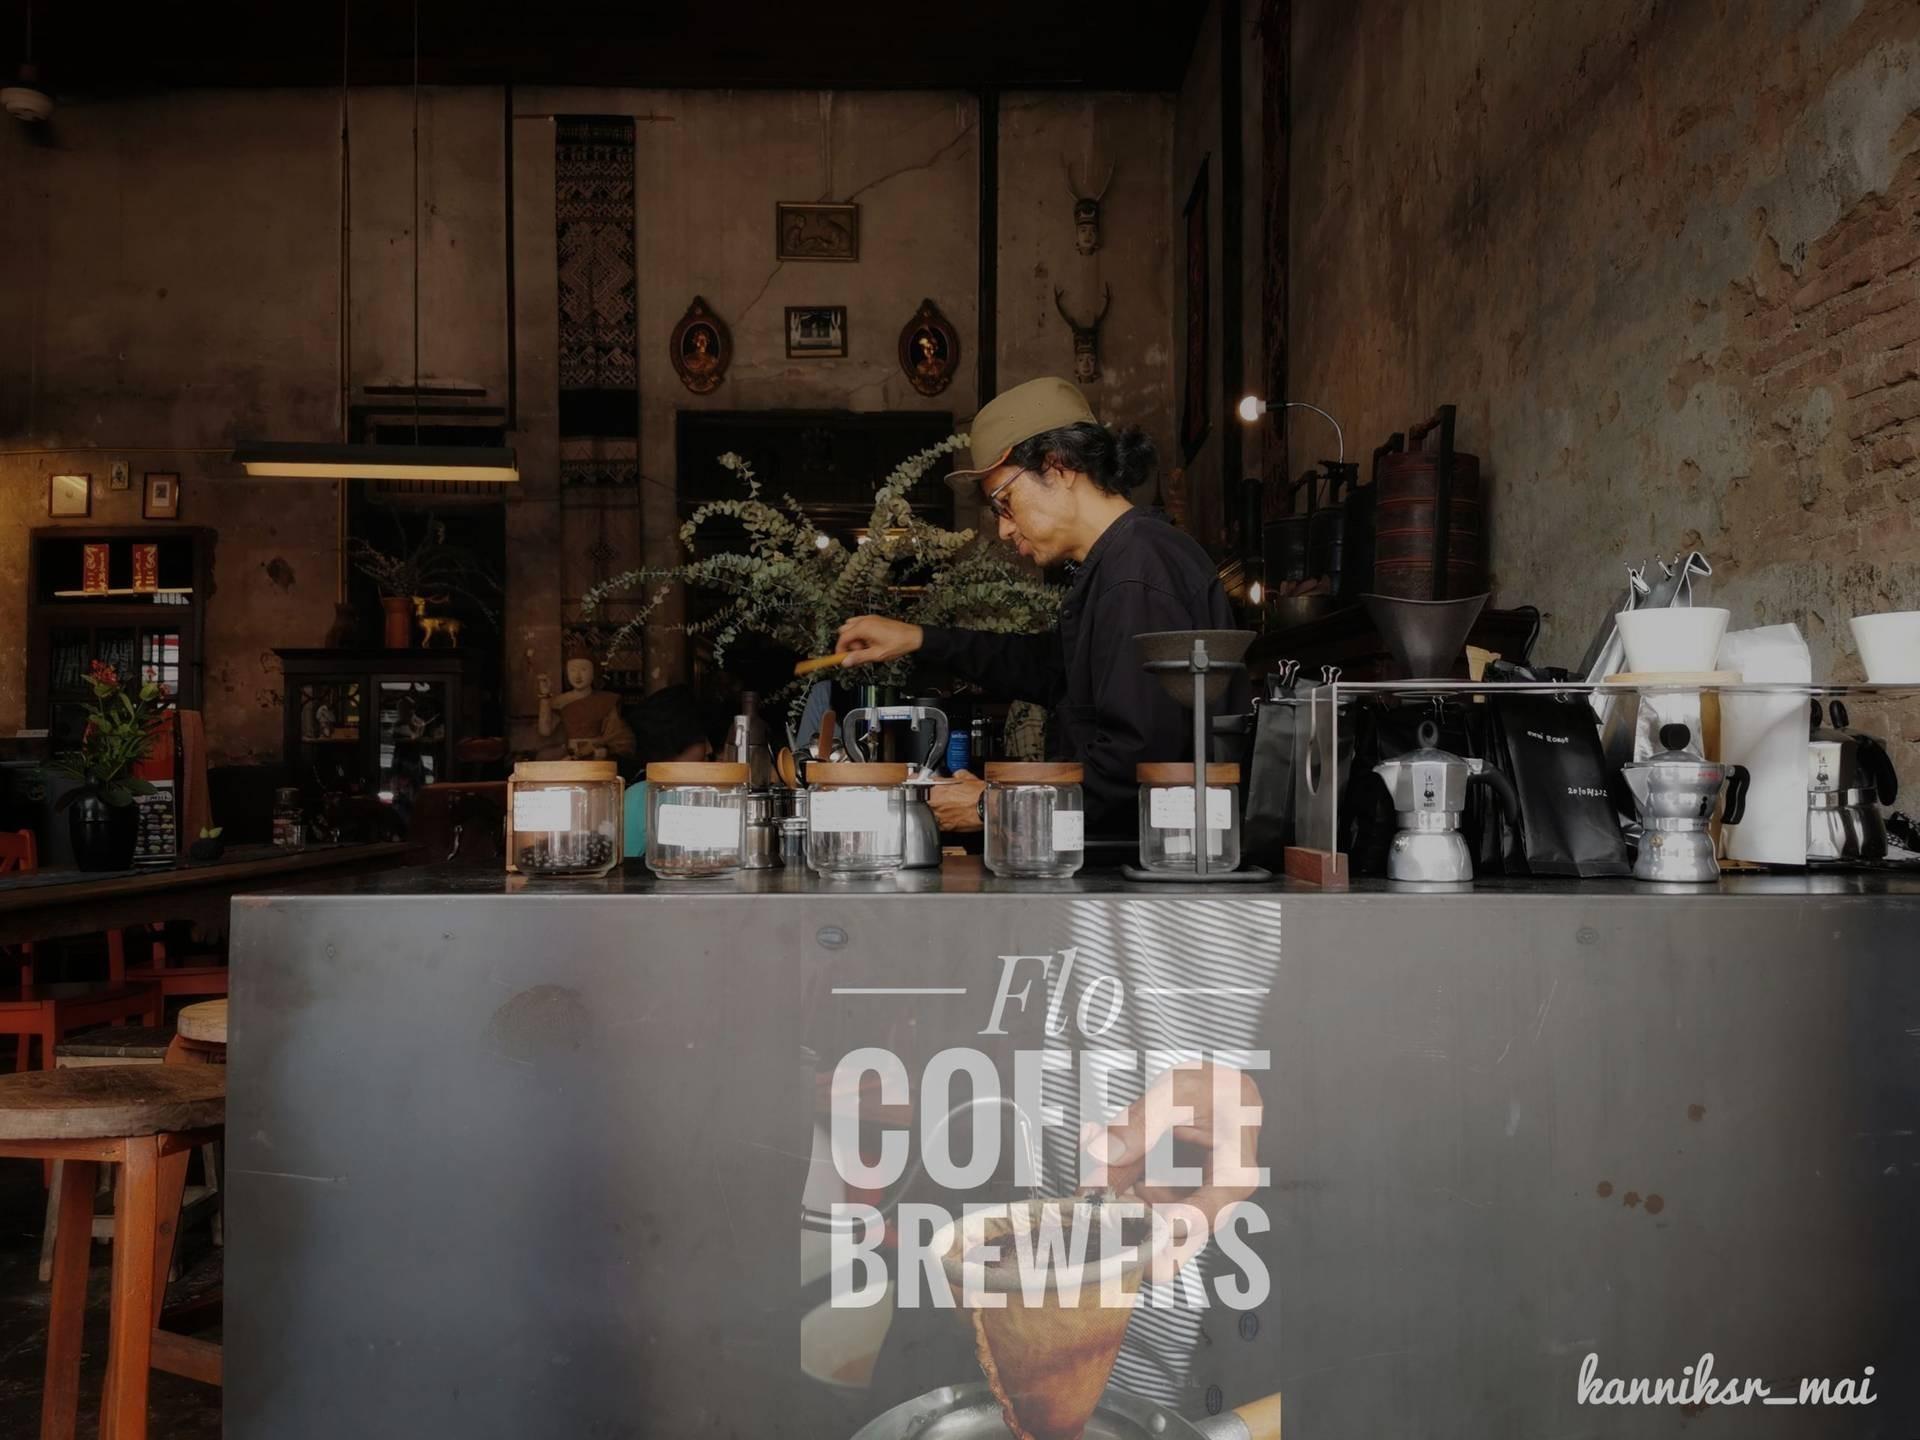 Flo coffee brewers